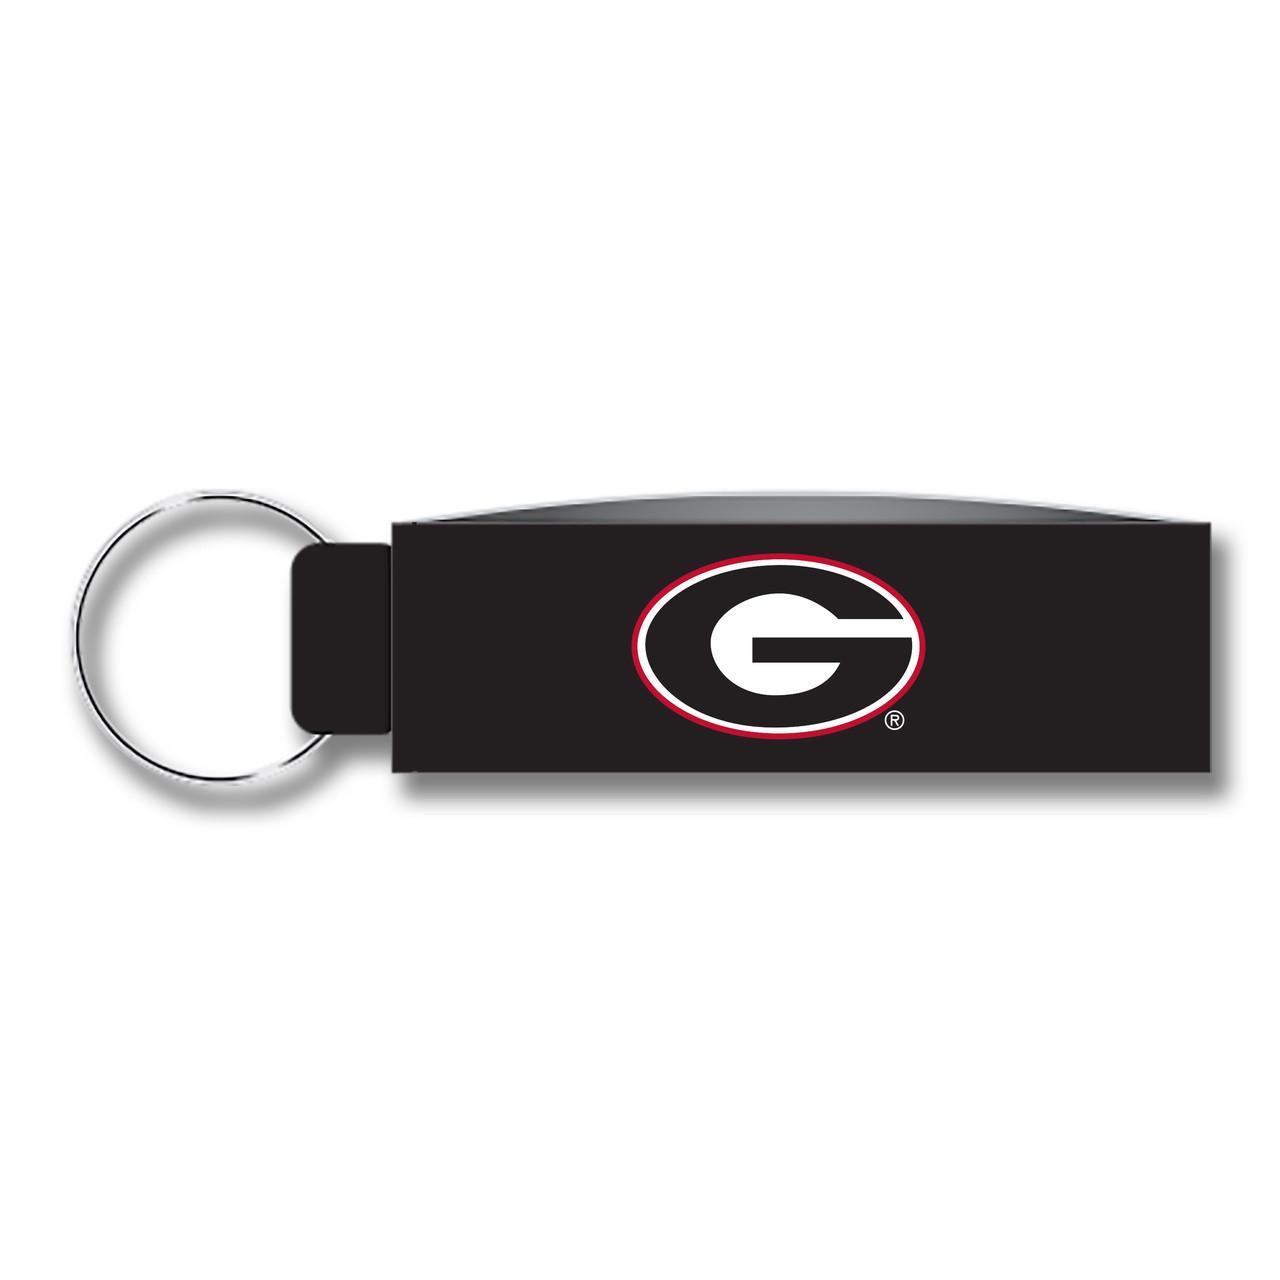 New University of Georgia  Keychains Lot Of 10